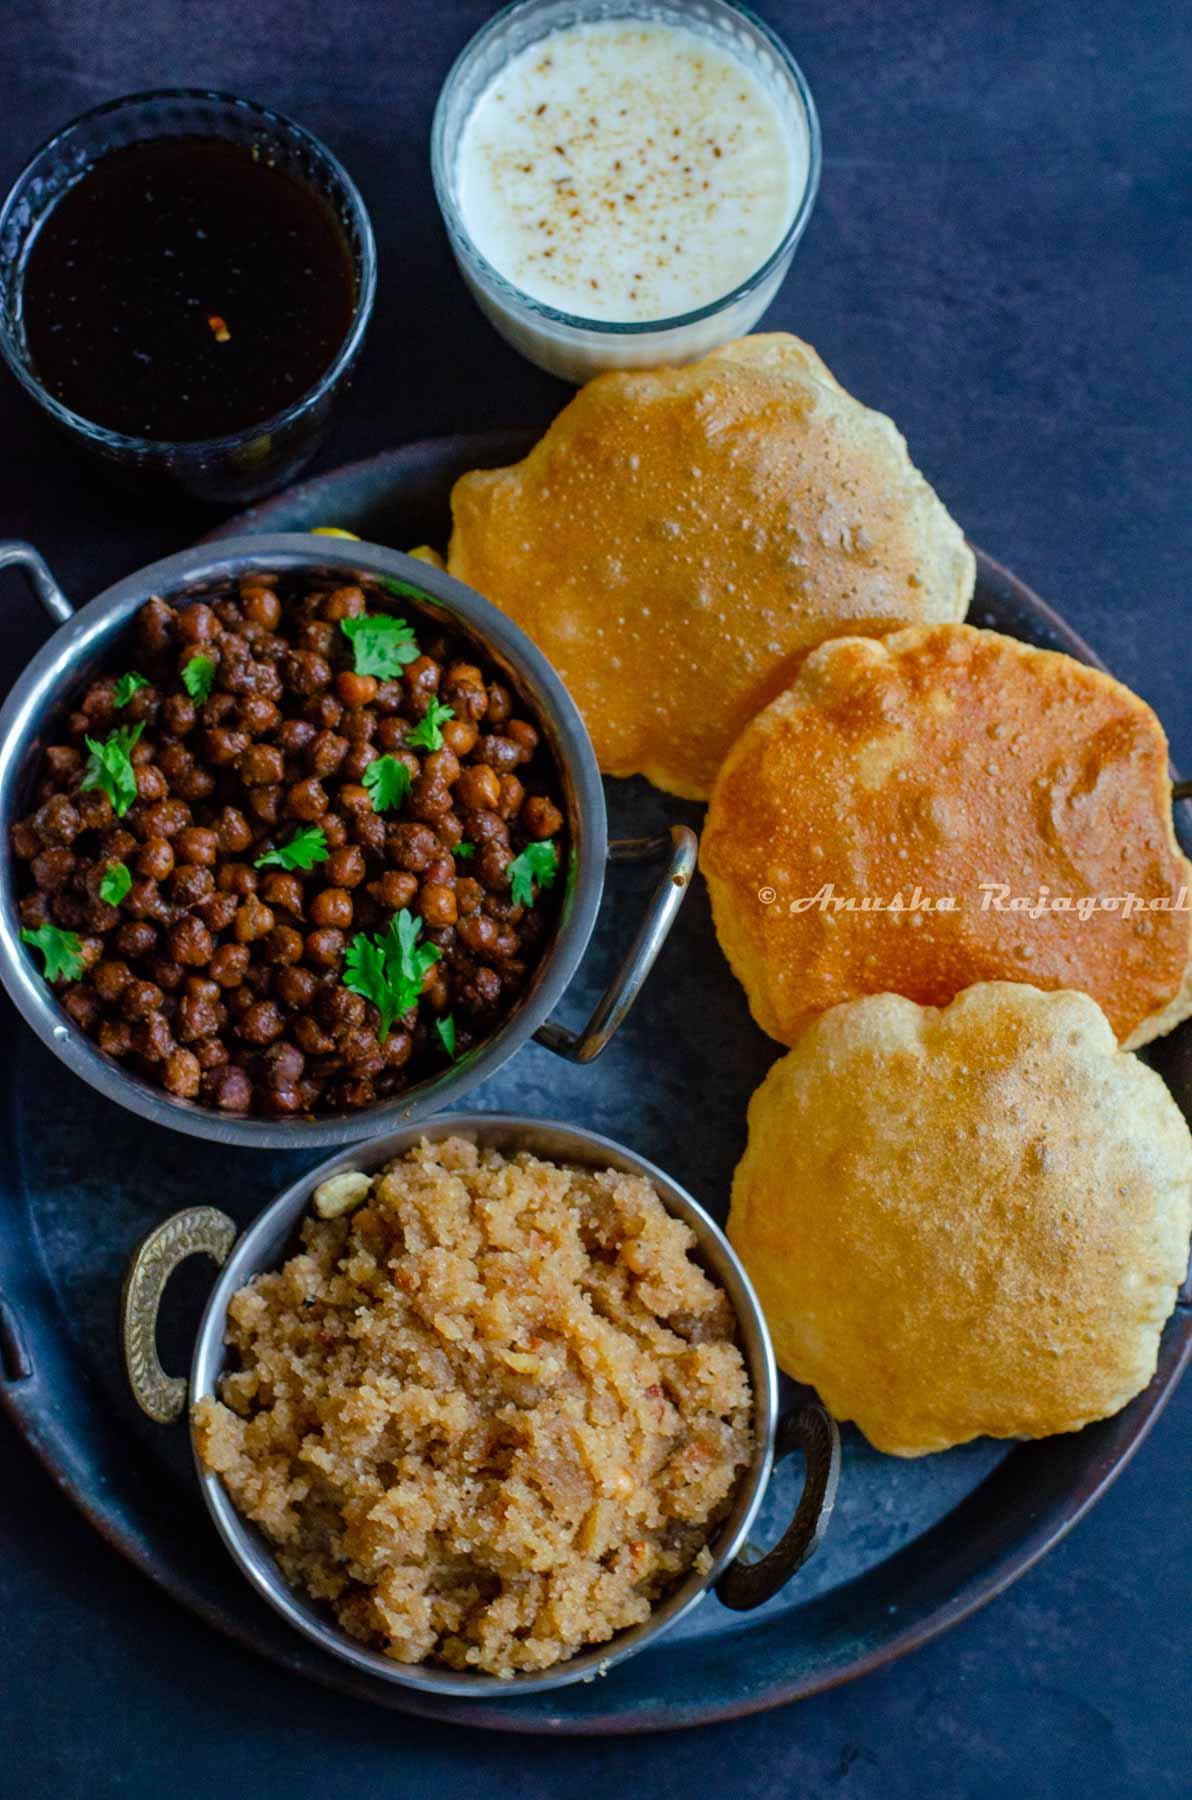 The Ashtami Prasad platter featuring sookhe Kala chana, sooji ka halwa, poori, chaas